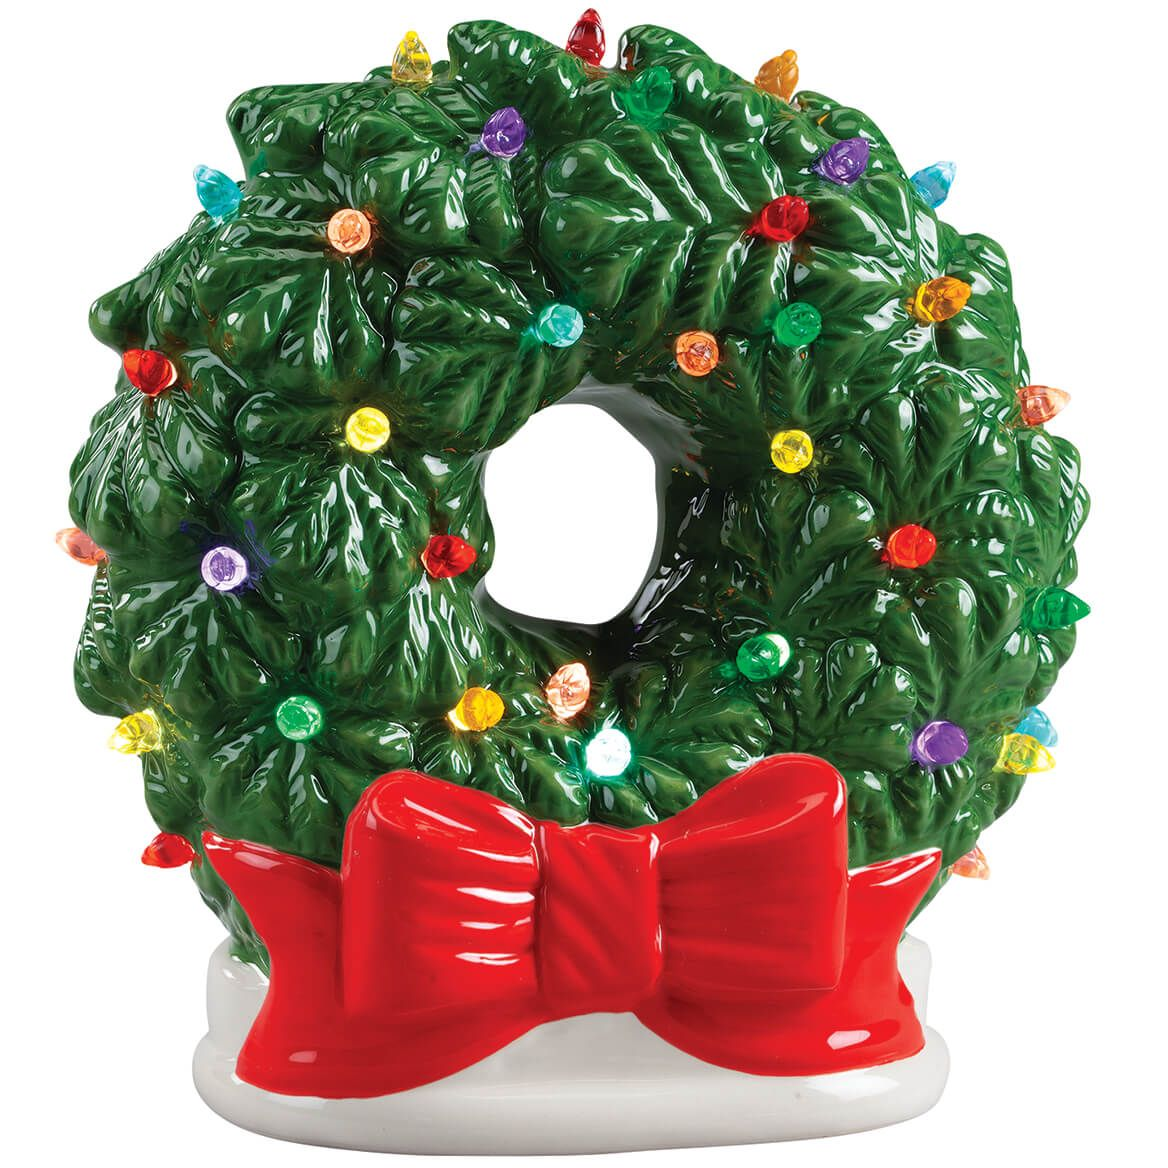 Vintage Ceramic Wreath Light-370327